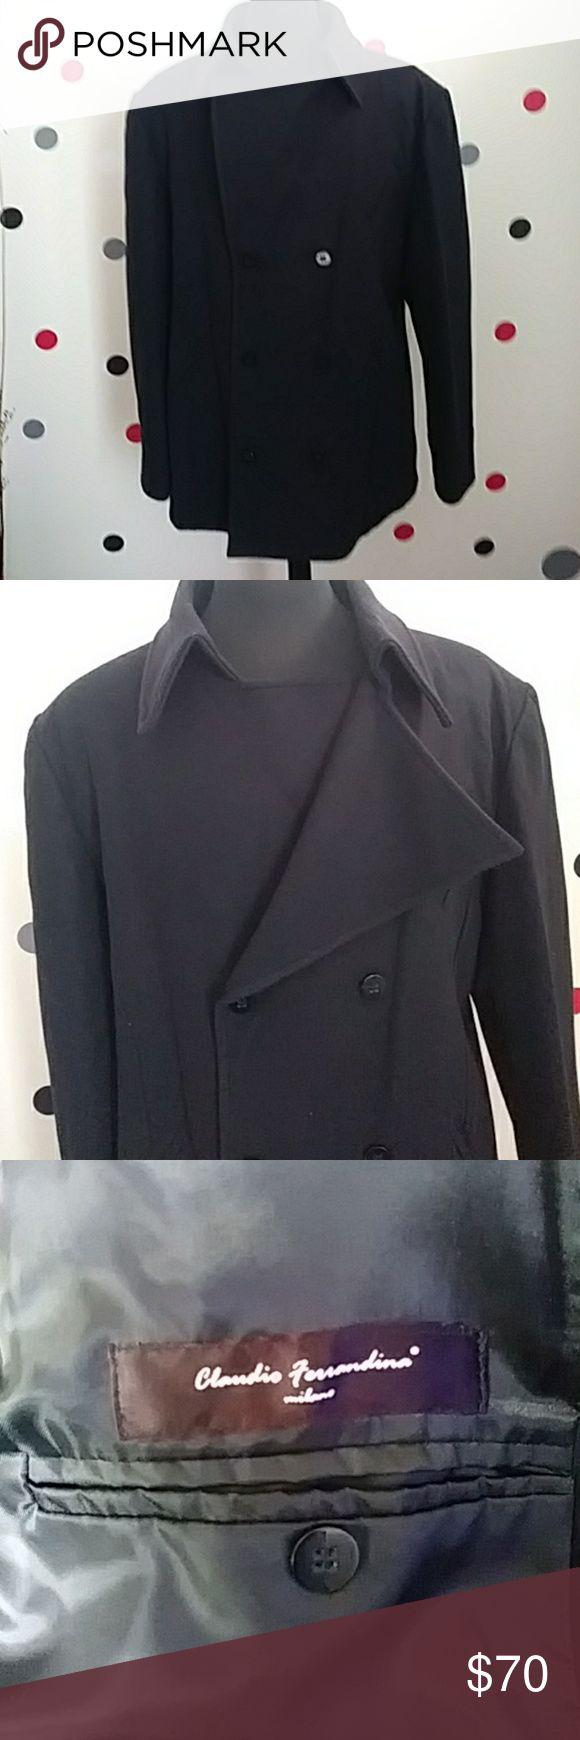 Men's Claudio Ferrandina Milano Pea Coat Wool Black Pea Coat made in Italy Claudio Ferrandina  Jackets & Coats Pea Coats